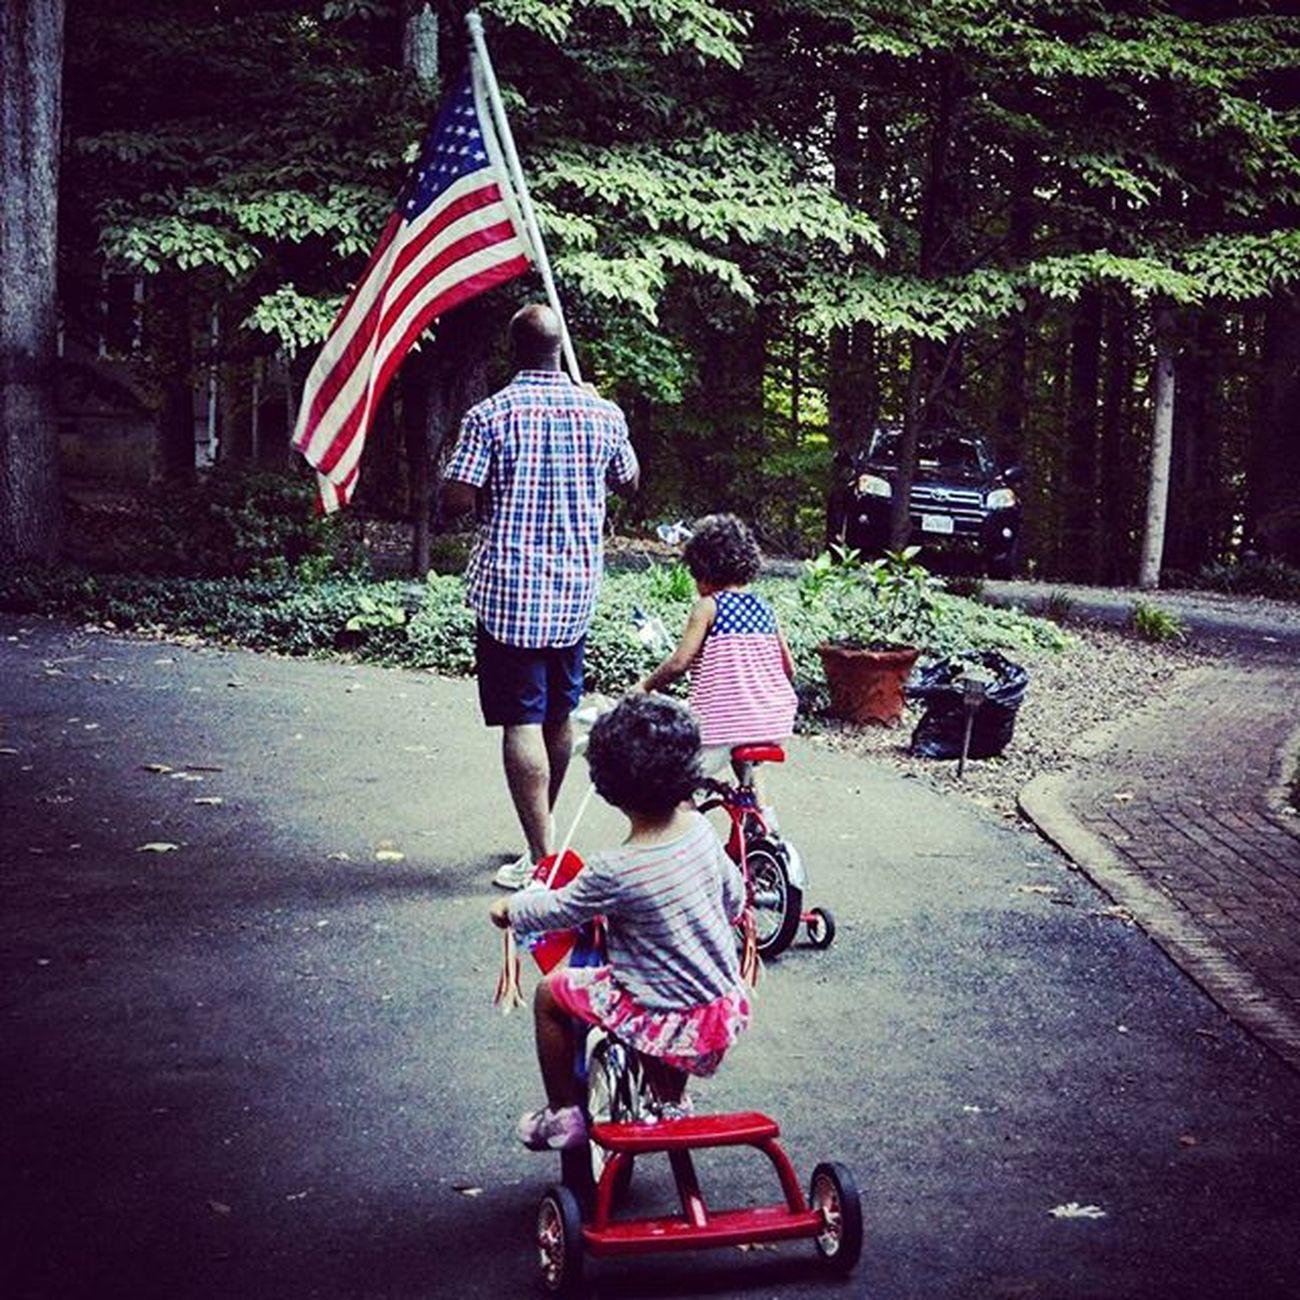 And there goes the parade! 4thofjuly Fourthofjuly2015 Fourthofjulyweekend TeamPinnock Fatherhood Moments